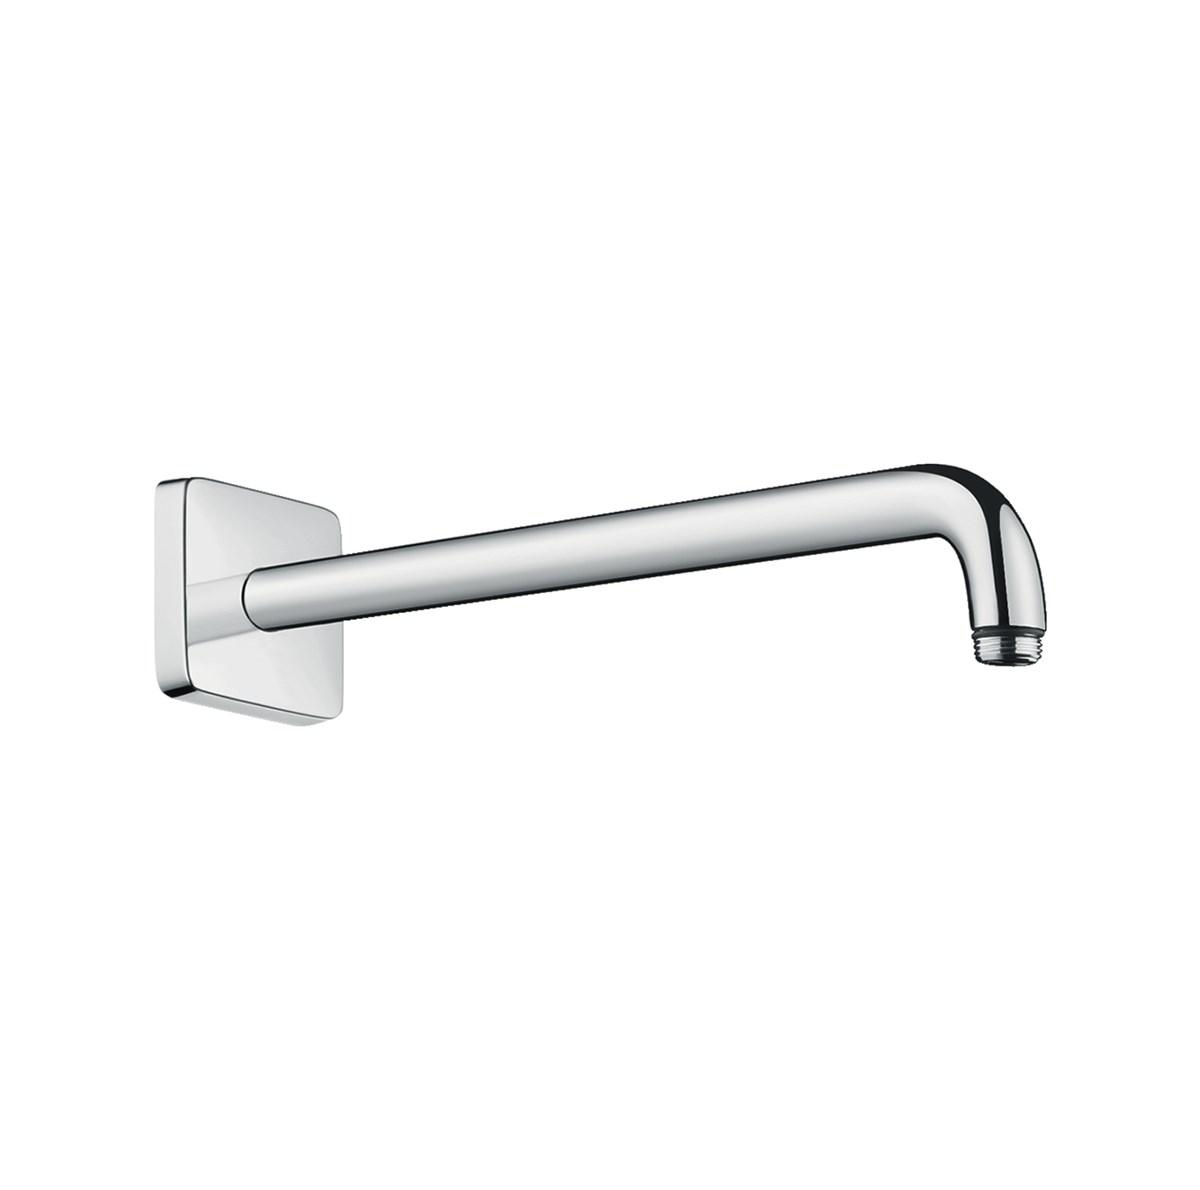 Hansgrohe-Shower-Arm-E-38.9-cm-27446000-Matisse-1